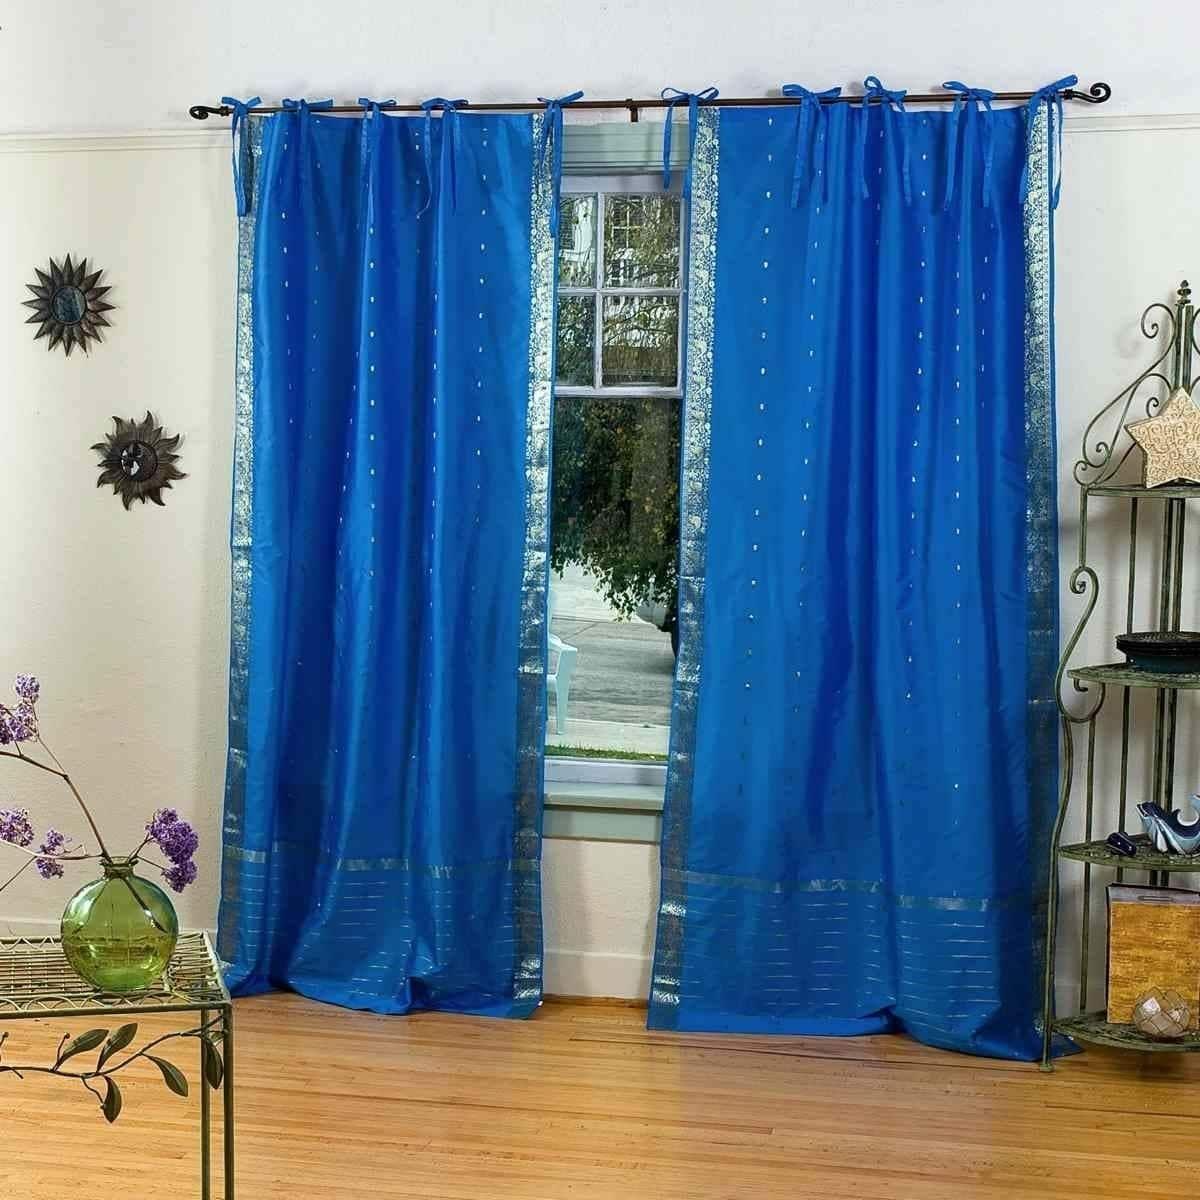 Indian selections enchanting blue tie top sheer sari curtain drape